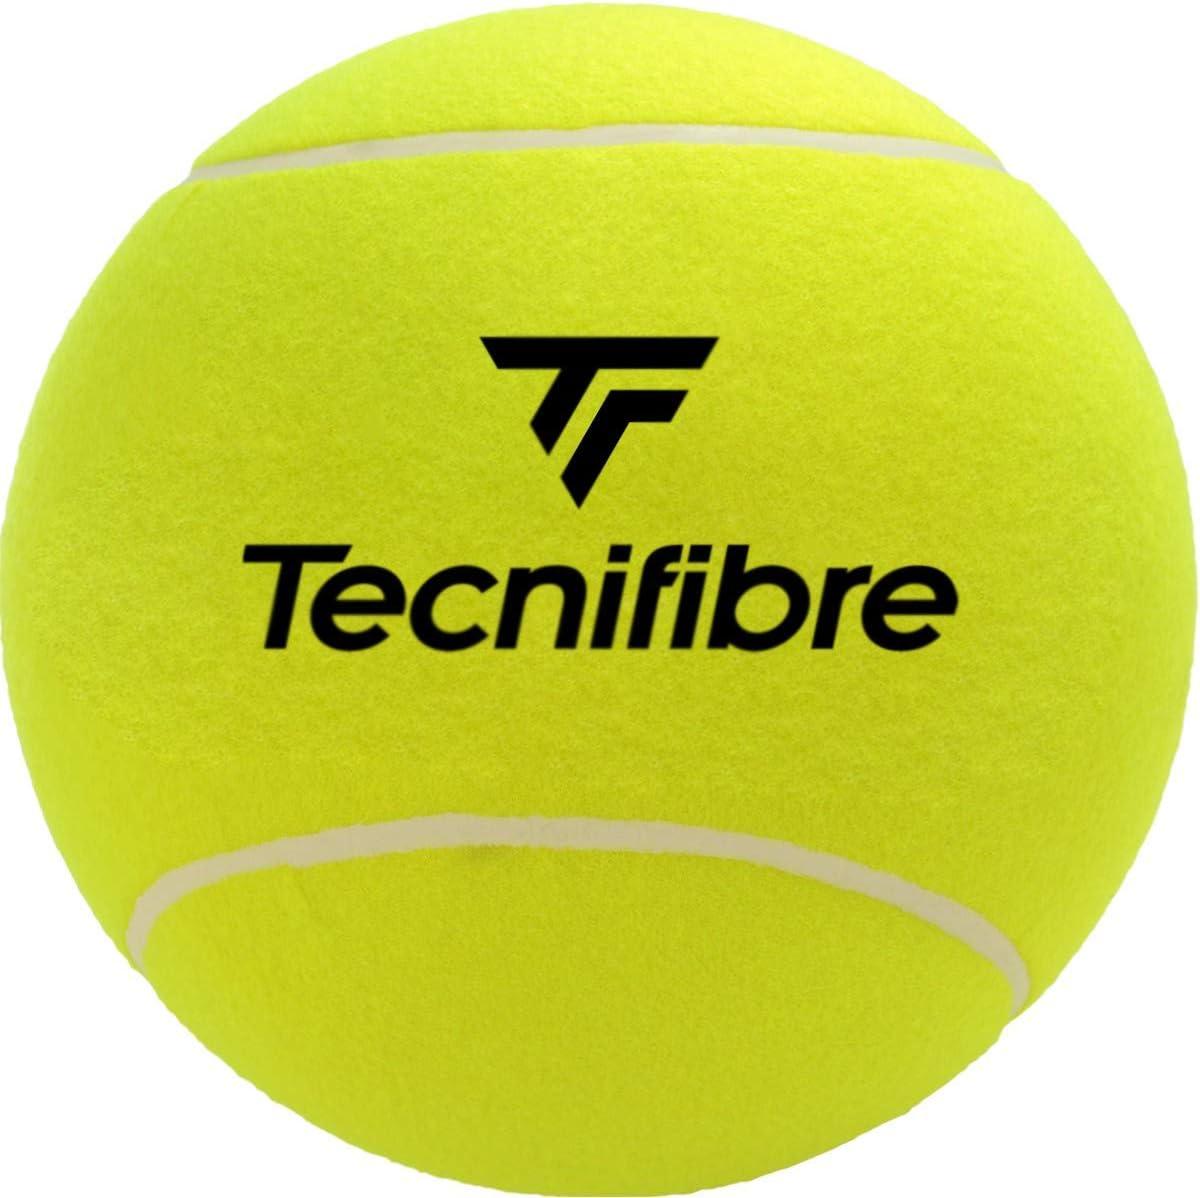 Tecnifibre Big Ball 12 cm - Accesorios de Tenis Unisex, Color Amarillo